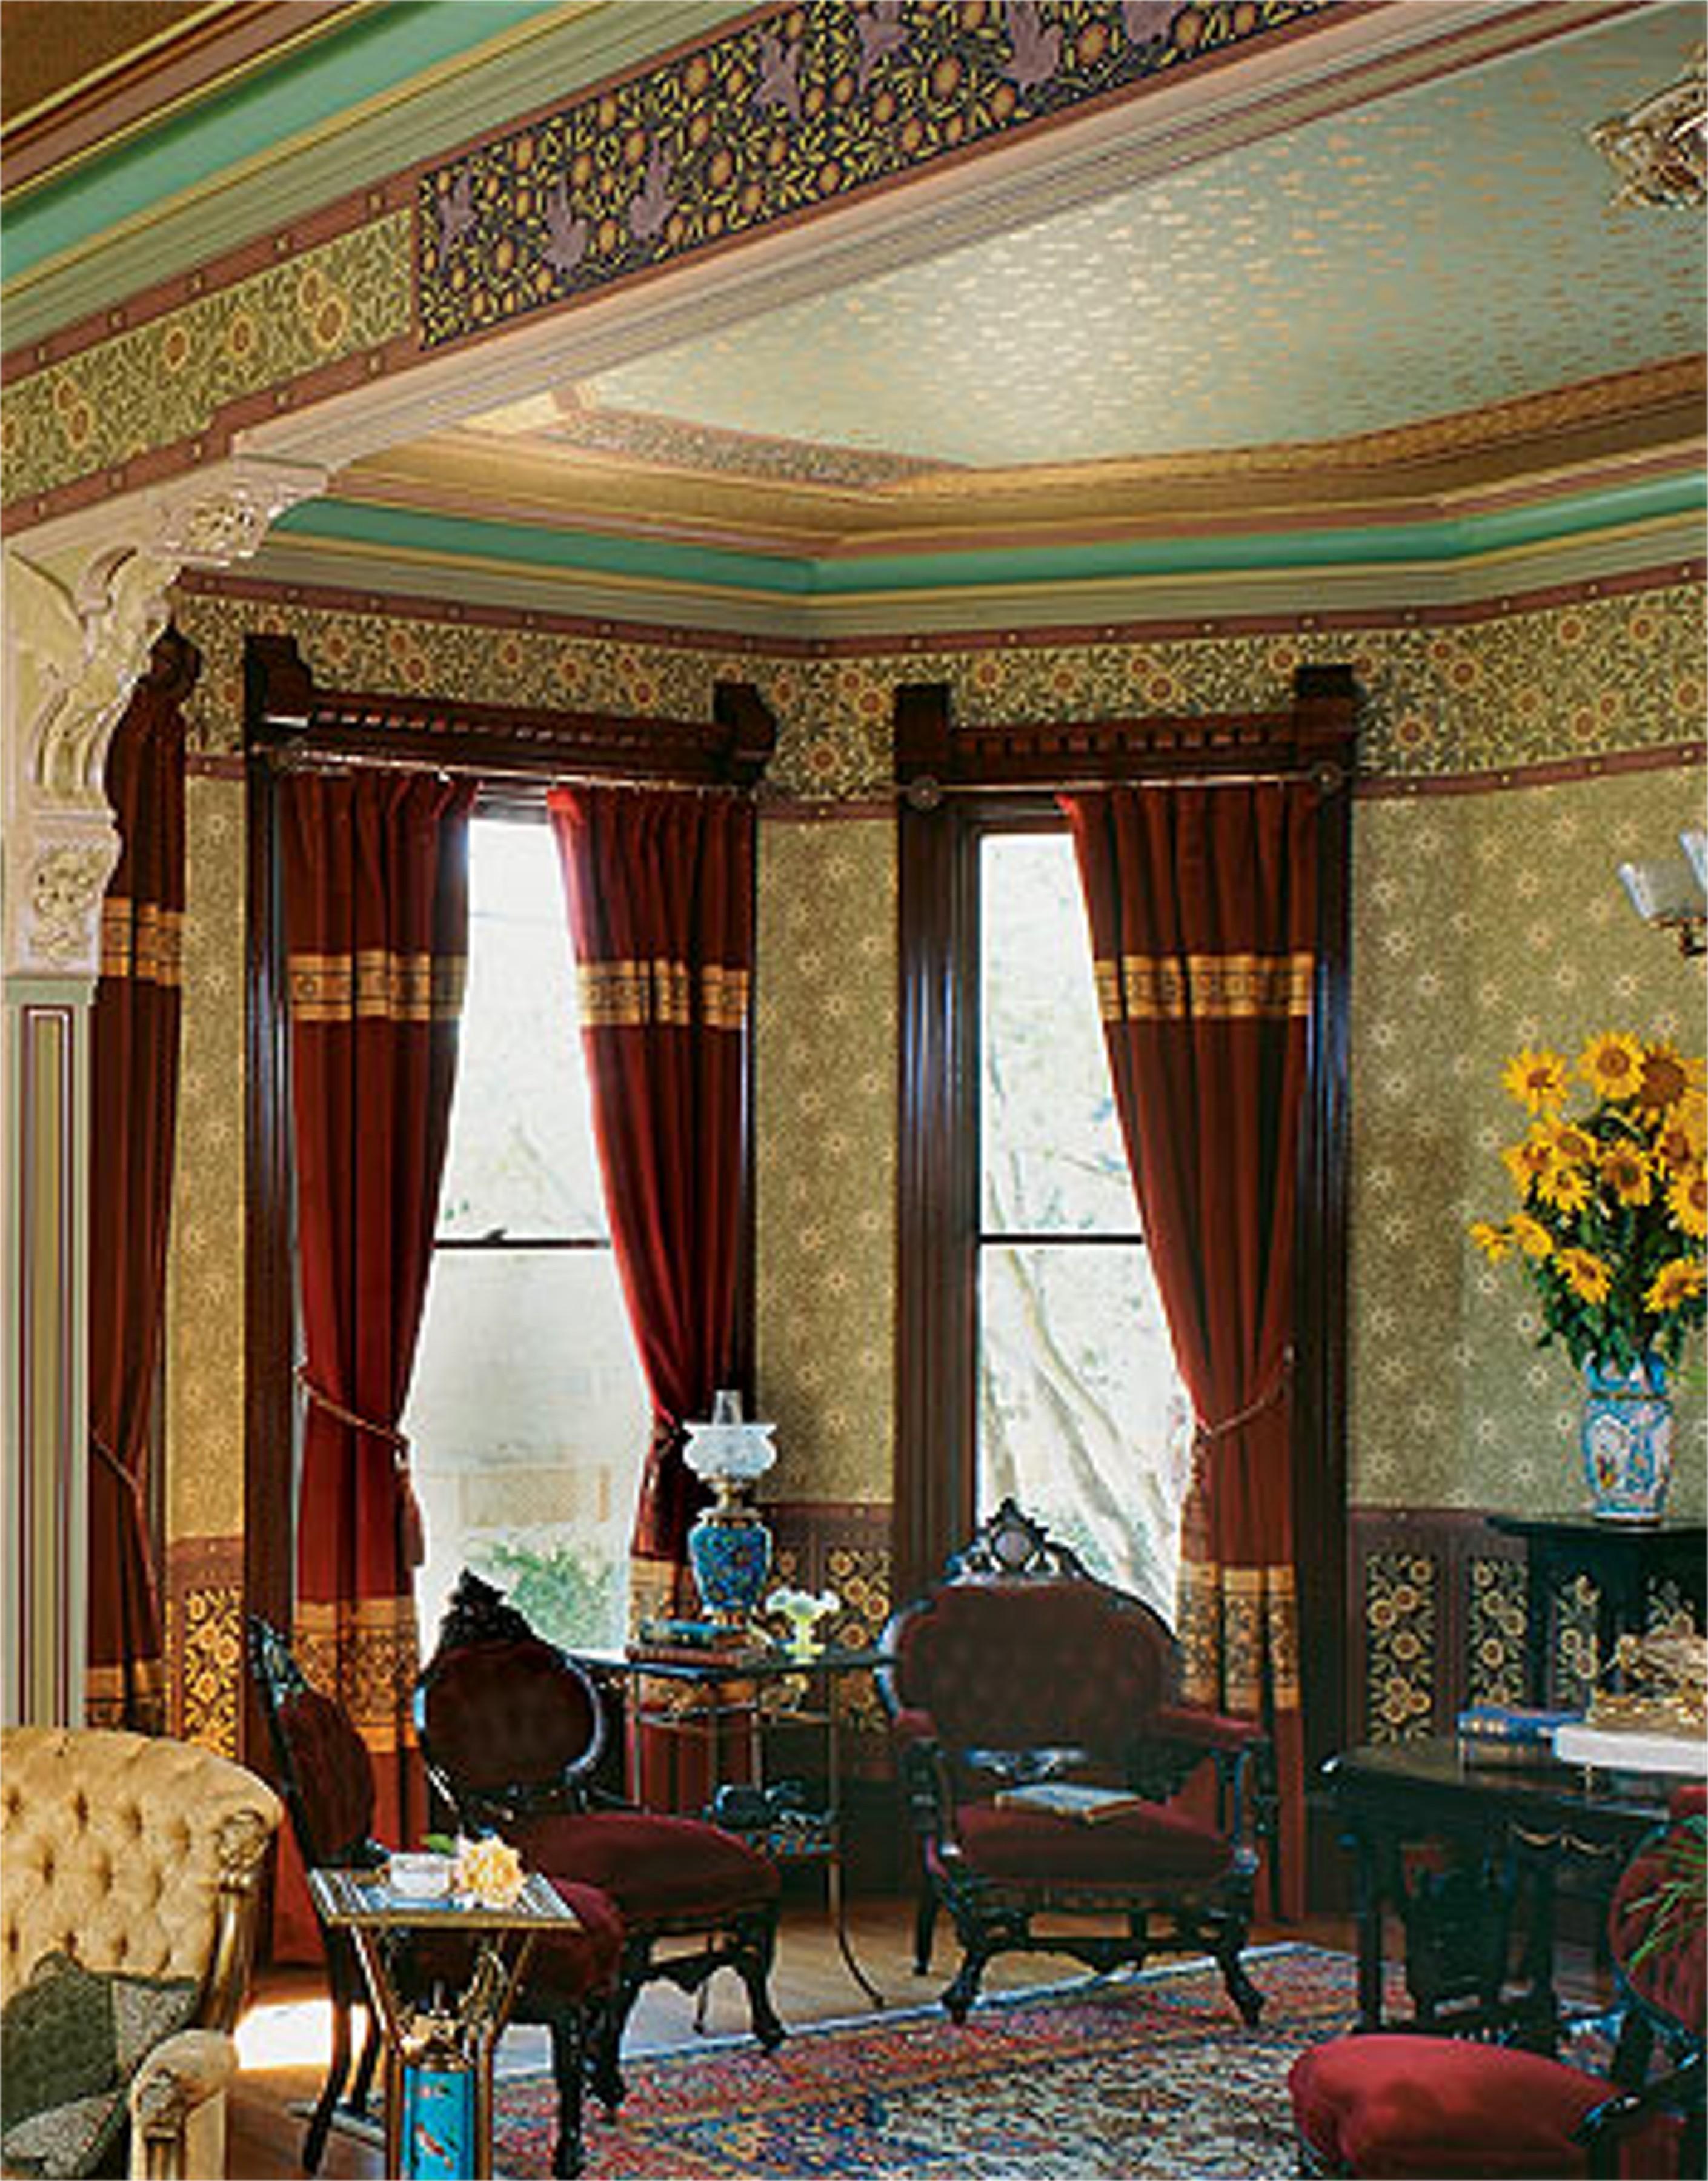 Victorian Room Design: Victorian Interior Design Ideas